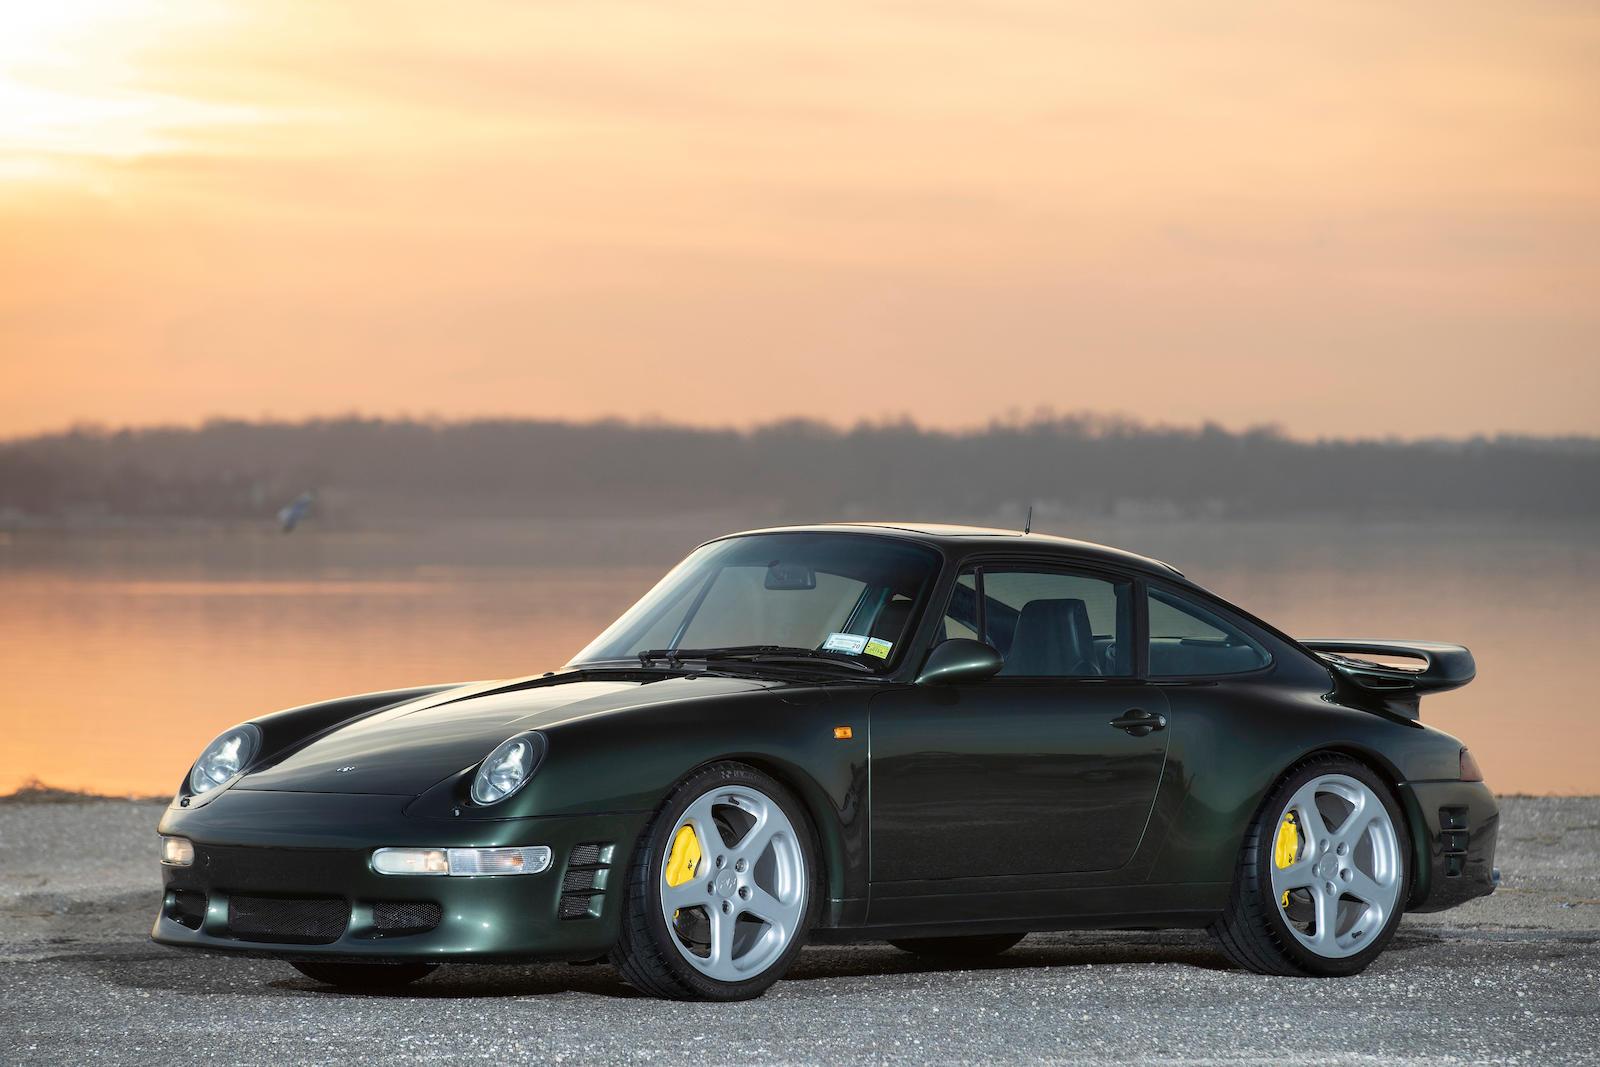 1998 RUF 911 Turbo R Coupe